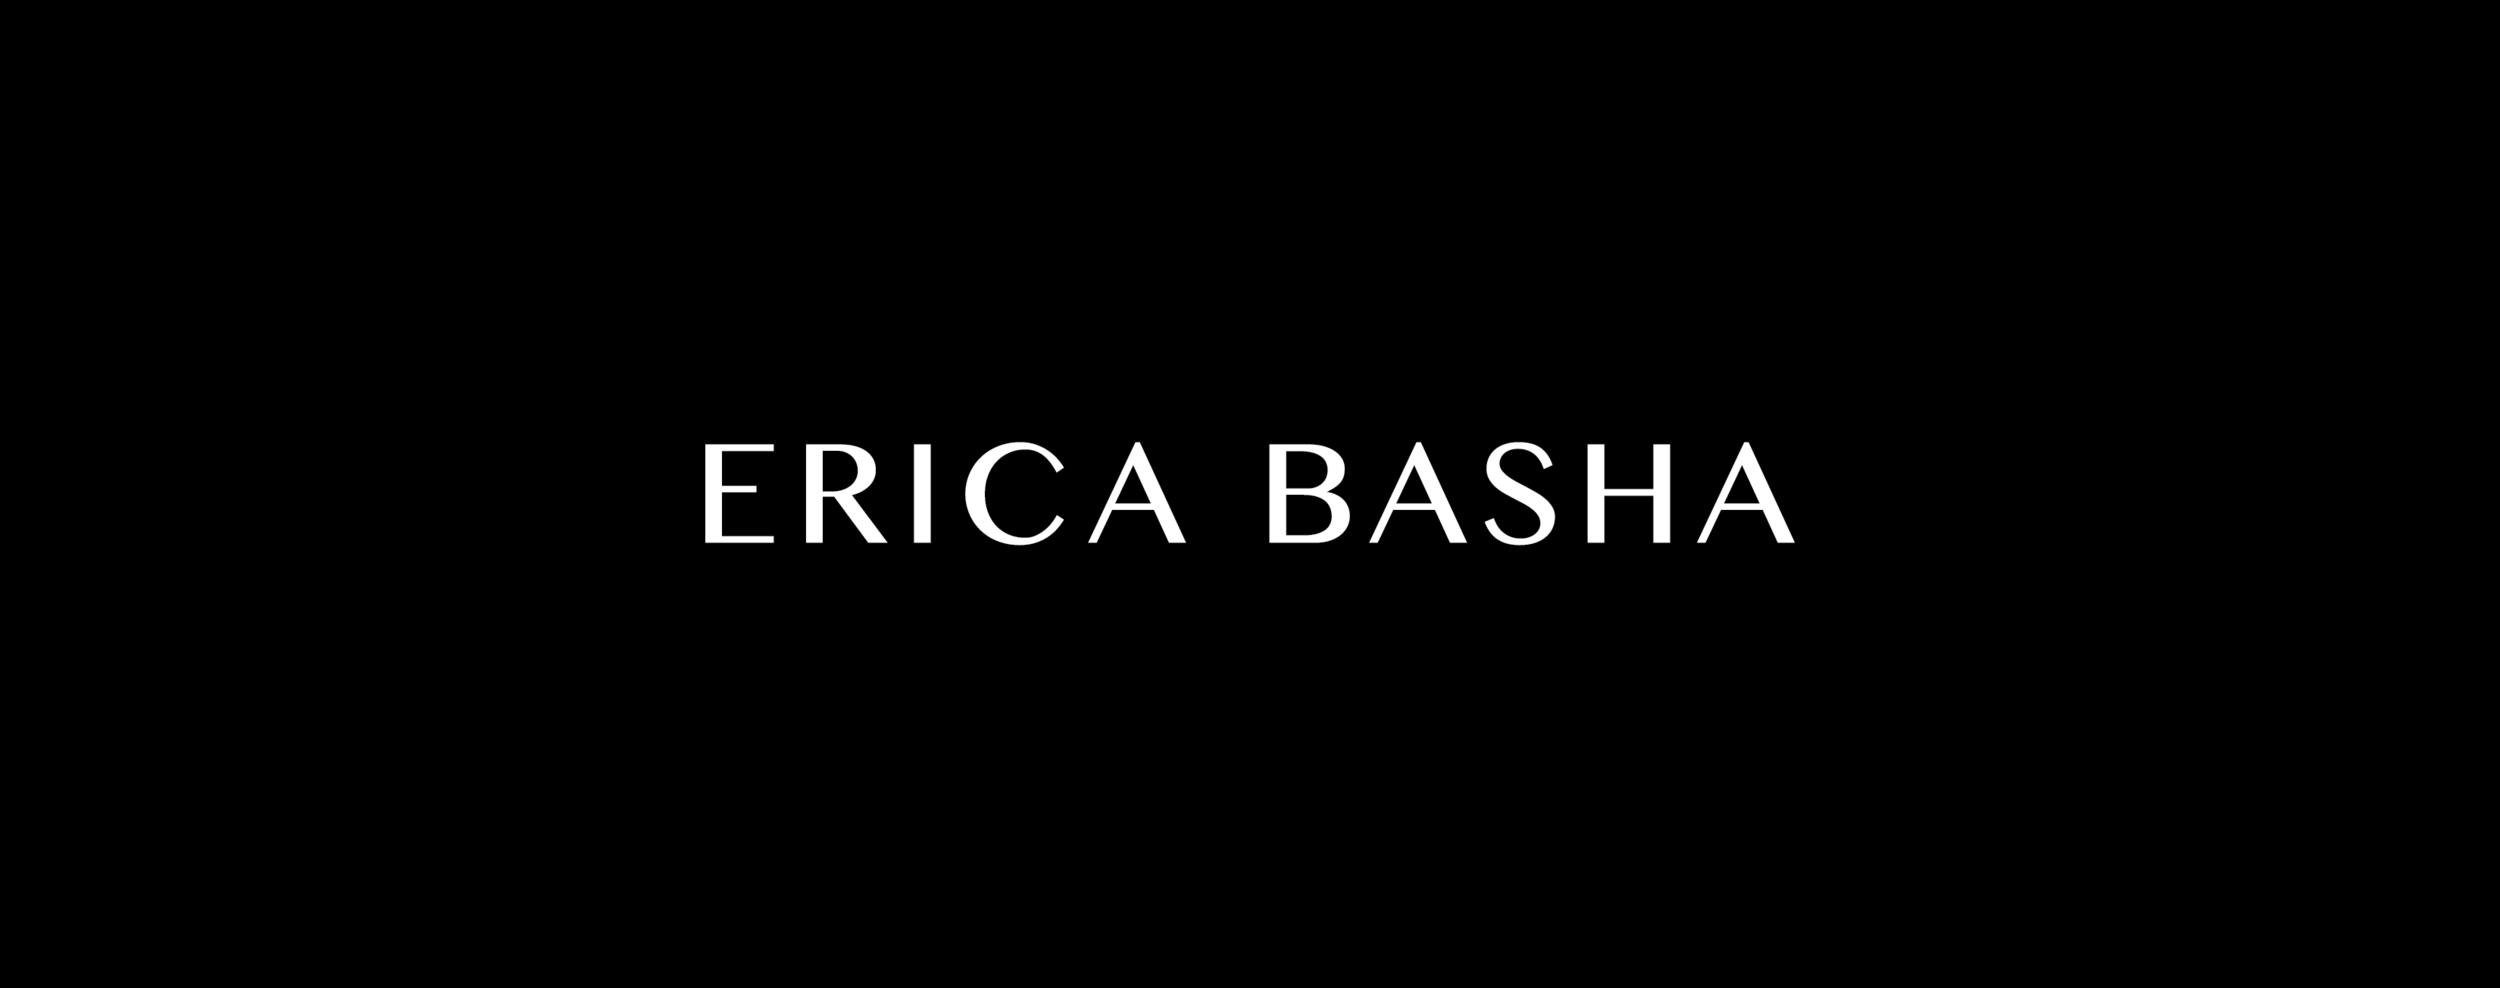 Erica Basha 1.png